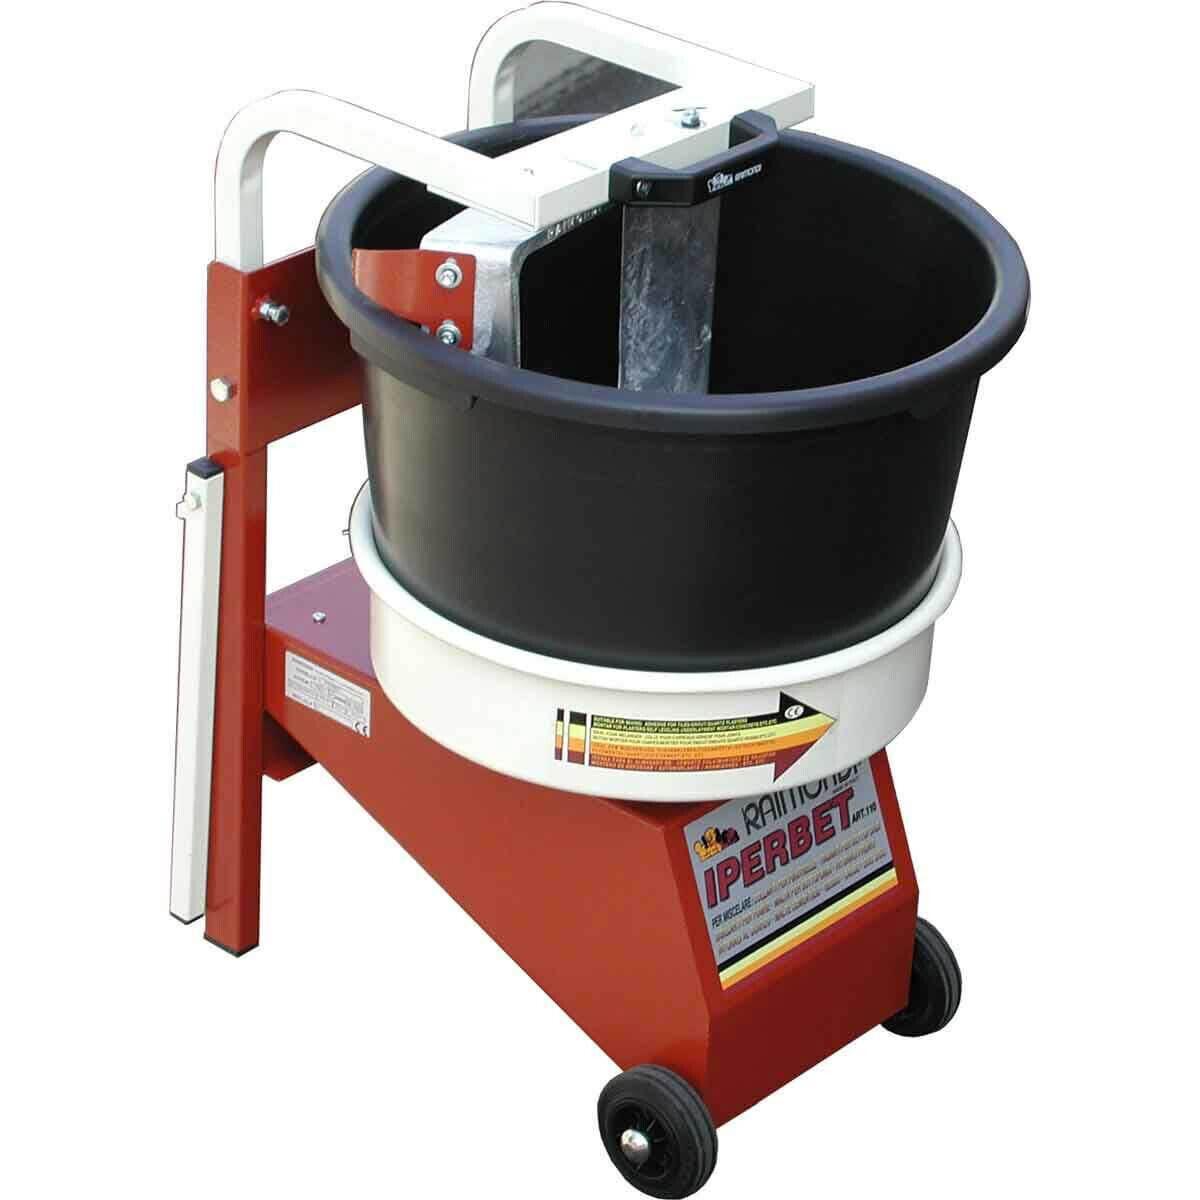 MXJPM Raimondi Iperbet Job Site Power Mixer For mixing adhesive, dry pack, thinset, mortar, concrete, epoxy, quartz plaster, etc